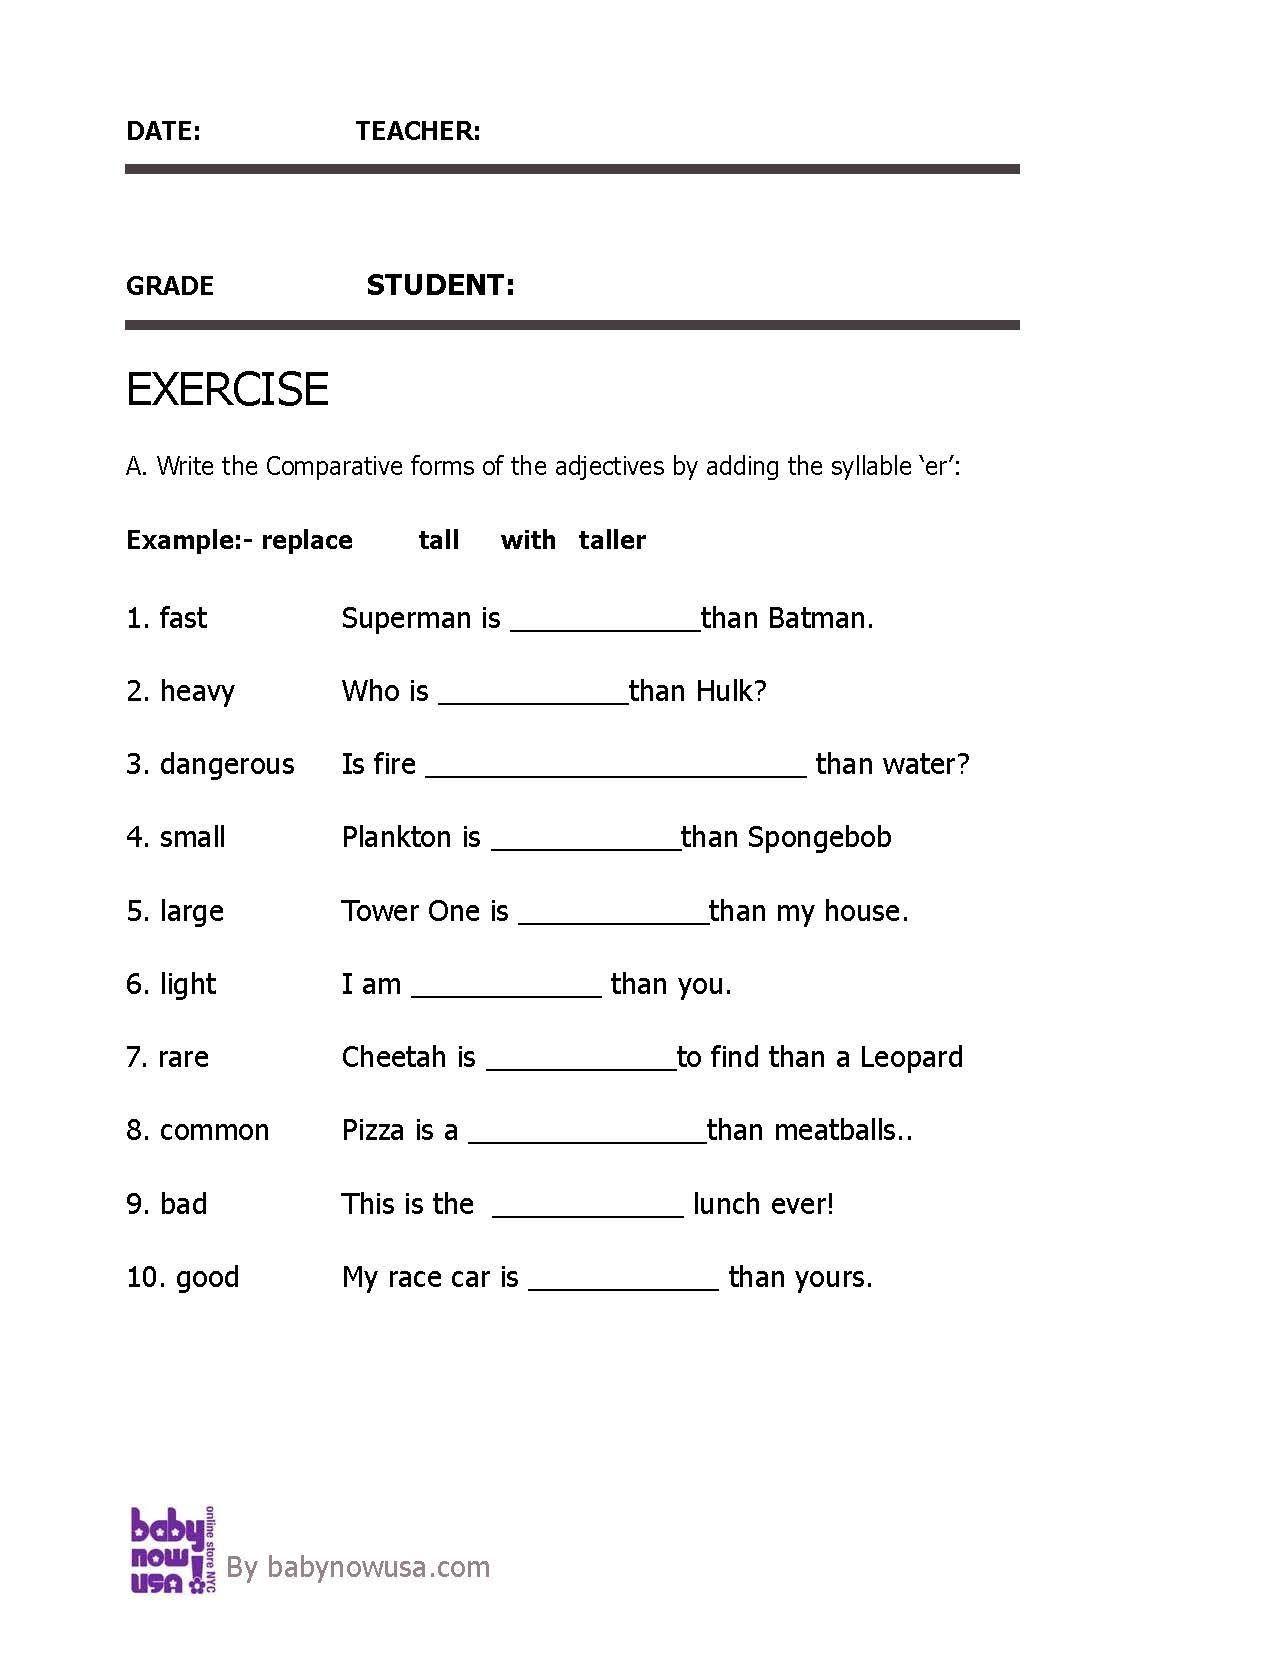 Worksheet Of Comparative Adjectives For Grade 2